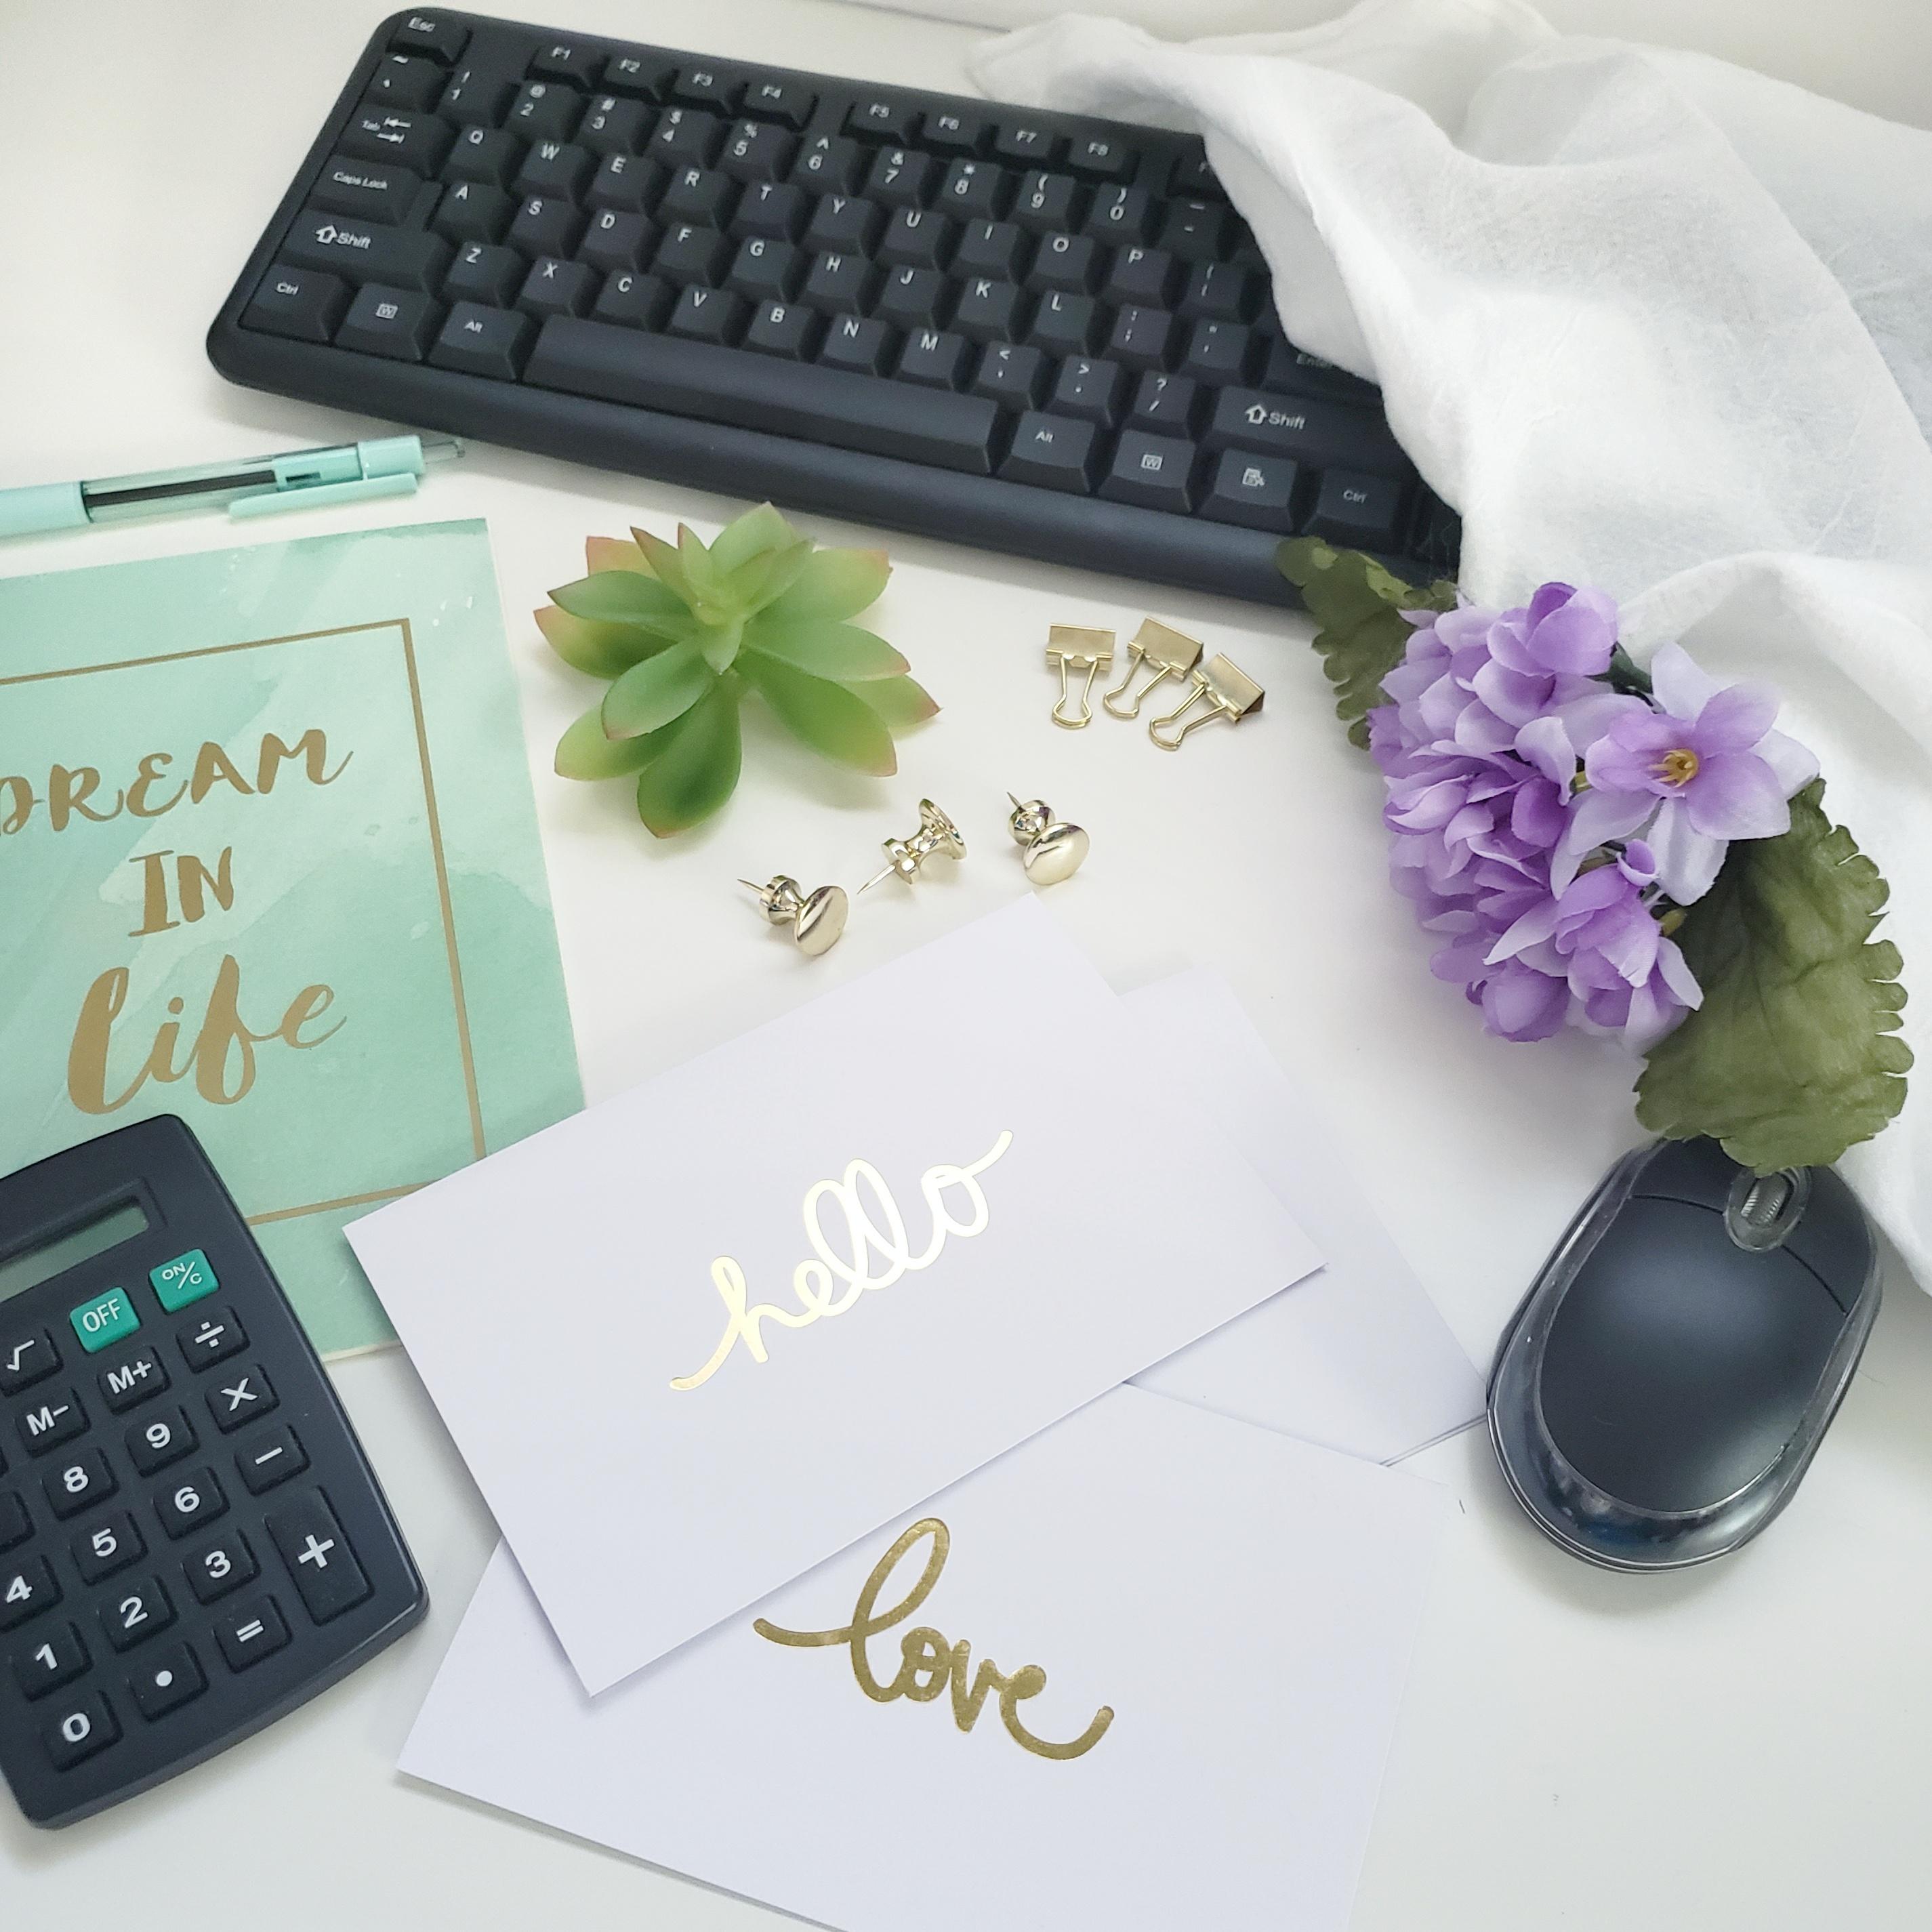 Dream in Life Flat lay kit